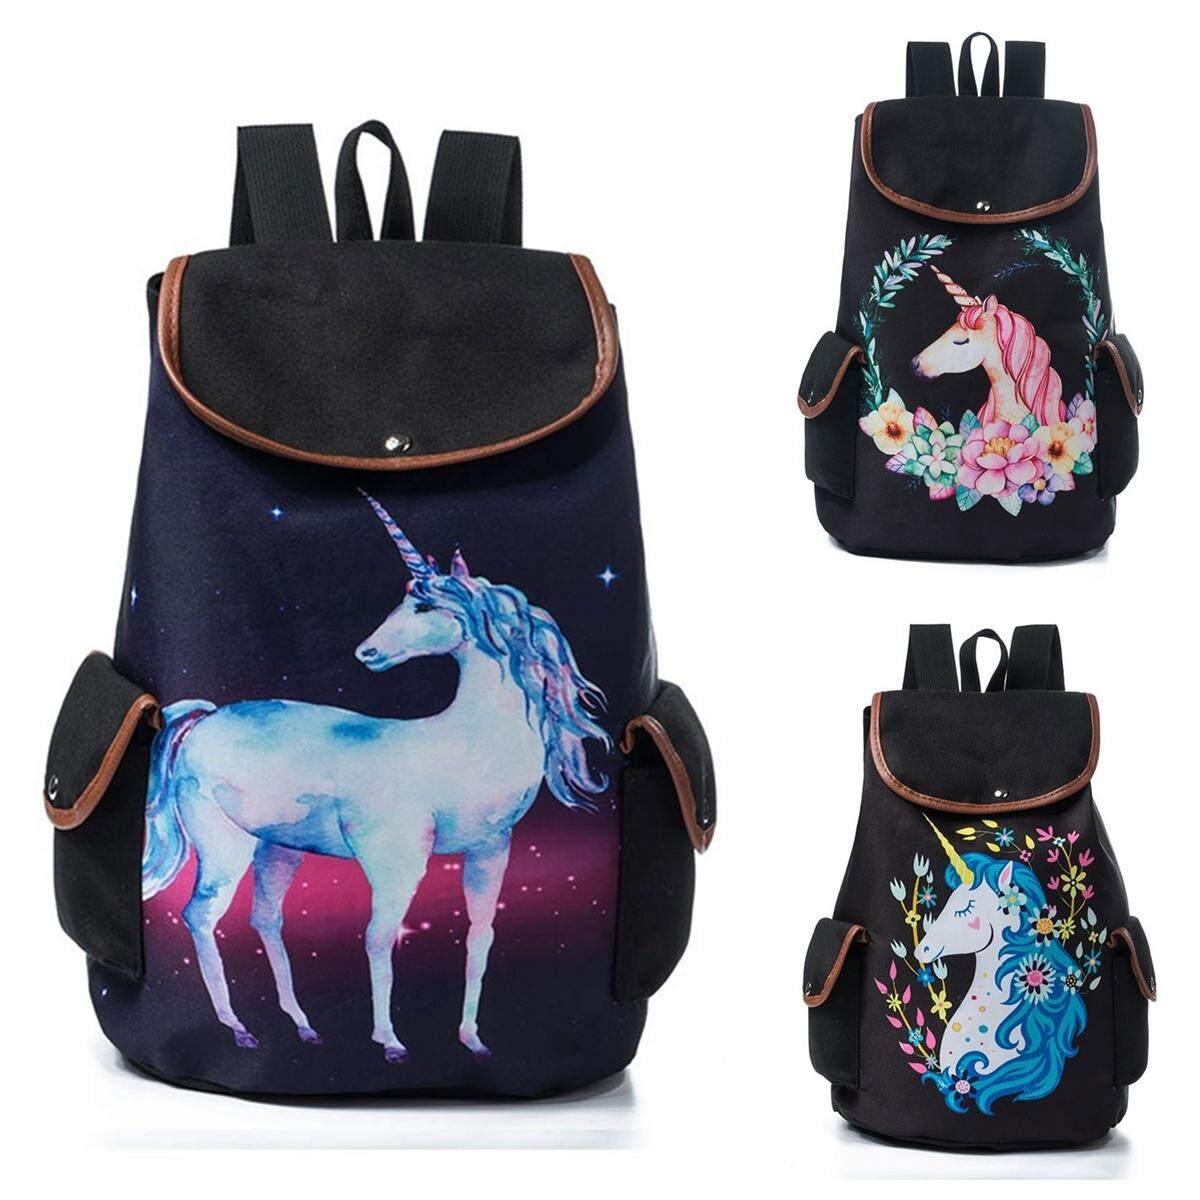 839809b9e9b8c Product details of Unicorn Printed School Backpack Drawstring Rucksack For Teenager  Girls Cartoon